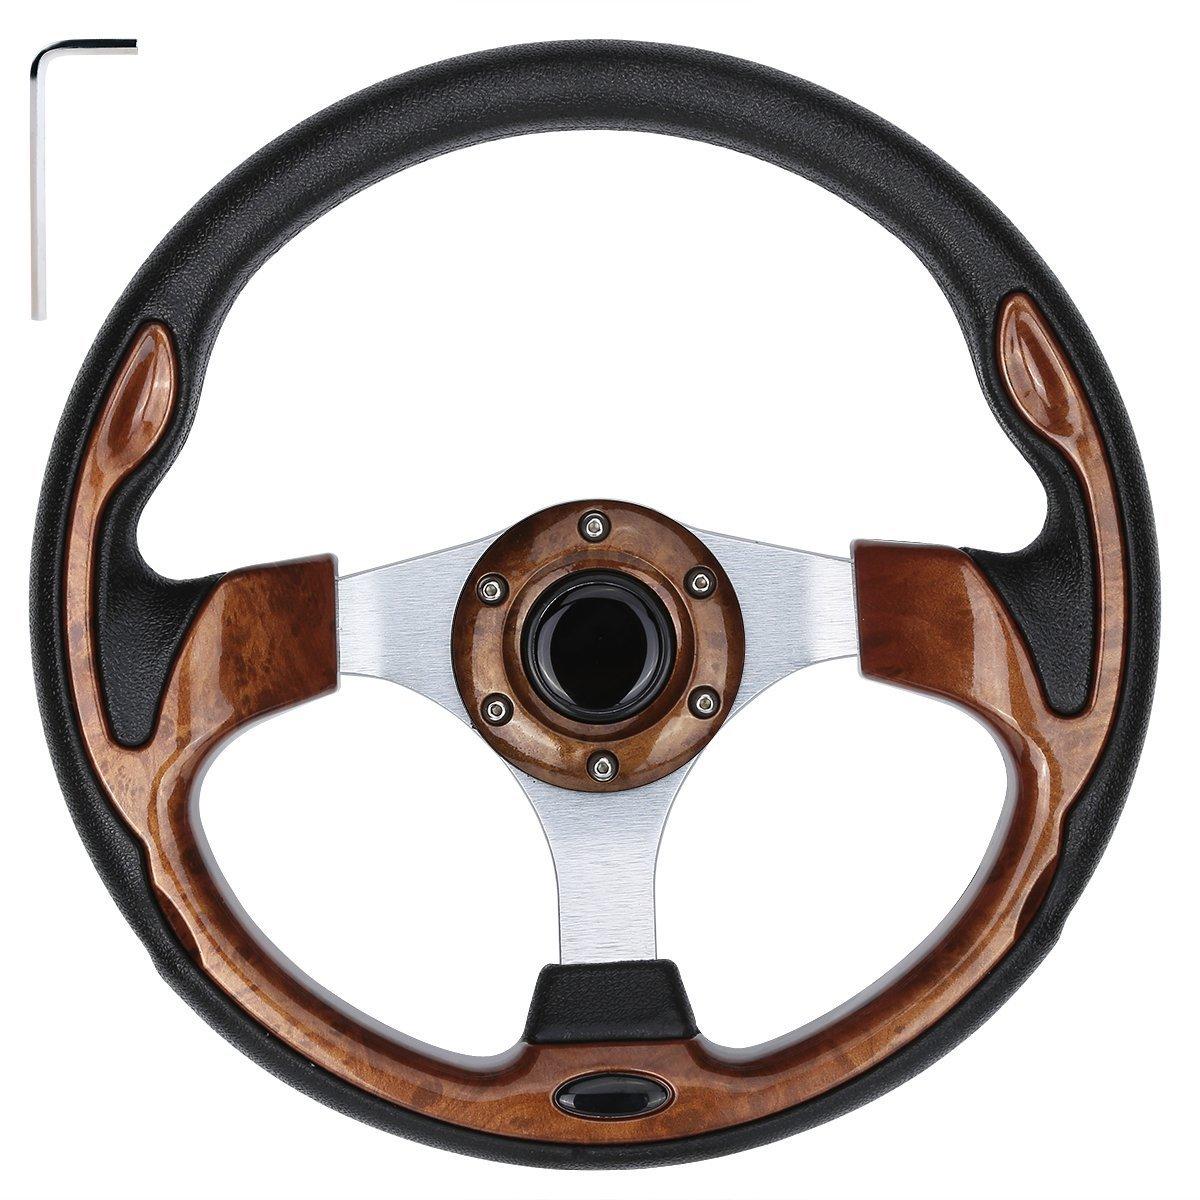 10L0L Golf Cart Steering Wheel, Generic of Most Golf cart EZGO Club Car Yamaha (style1 Wood)